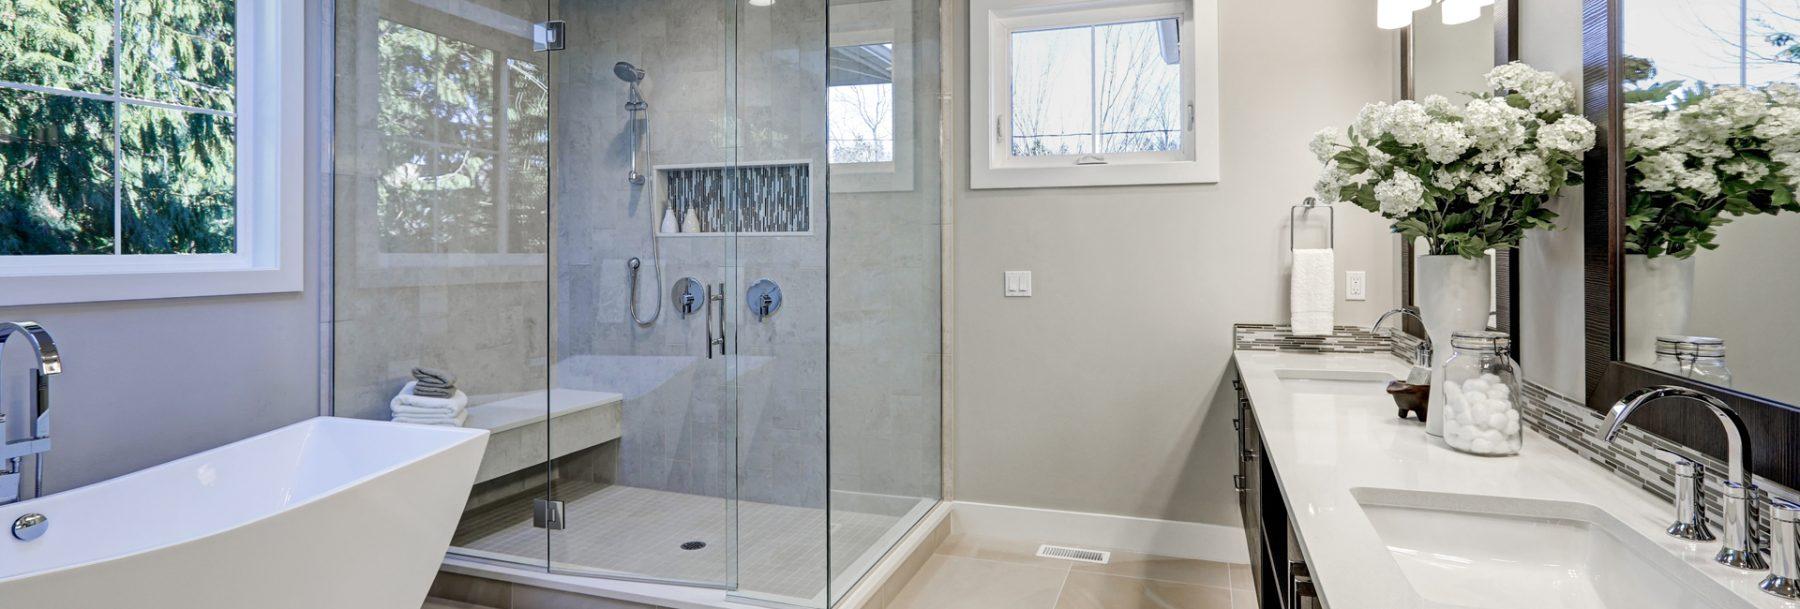 Swell Bathroombeautiful Back2Bath Home Remodeling Inspirations Basidirectenergyitoicom